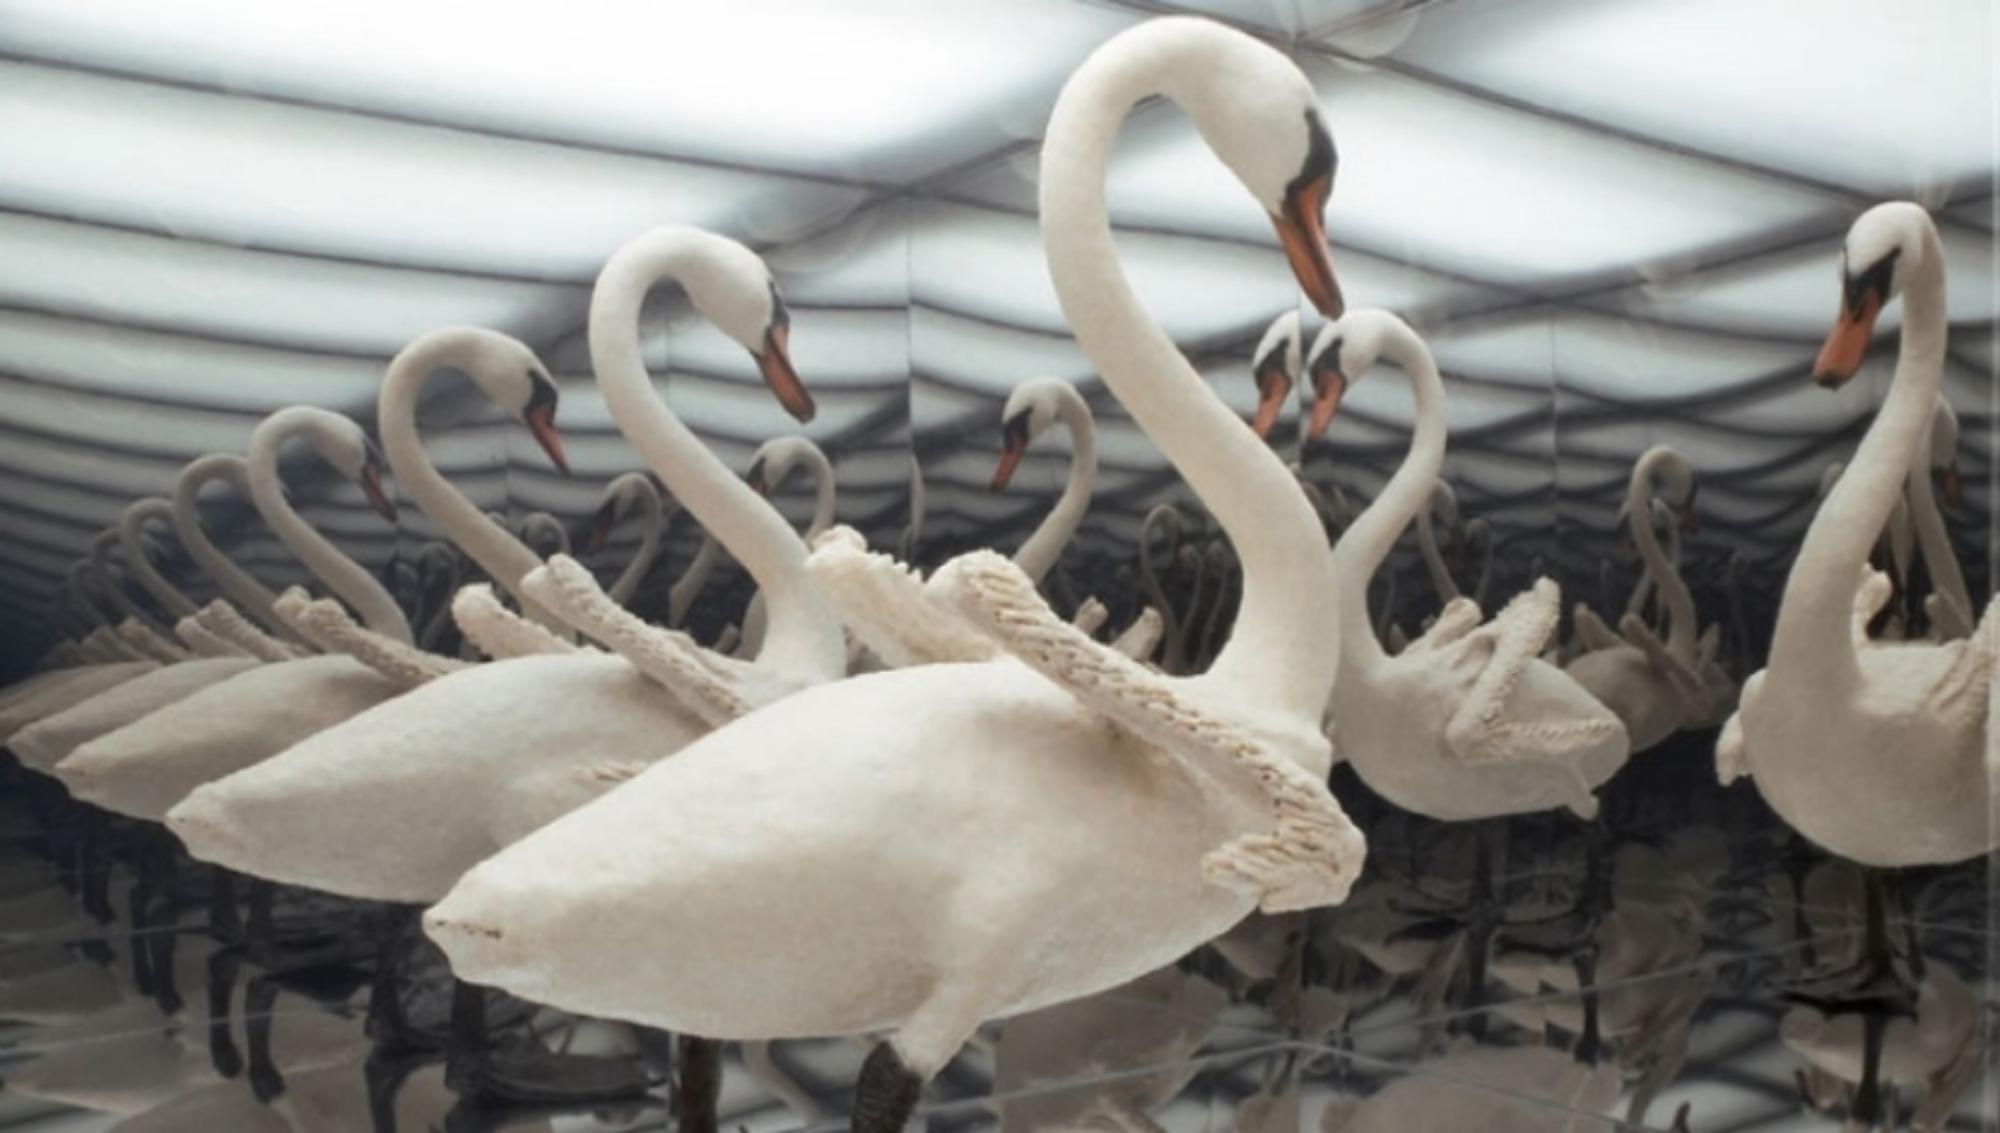 Image: Jane Benson,Naked Swan,Plexiglass, taxidermy swan, lights, two-way mirror, aluminum and silicon, 2006 / ©Jane Benson